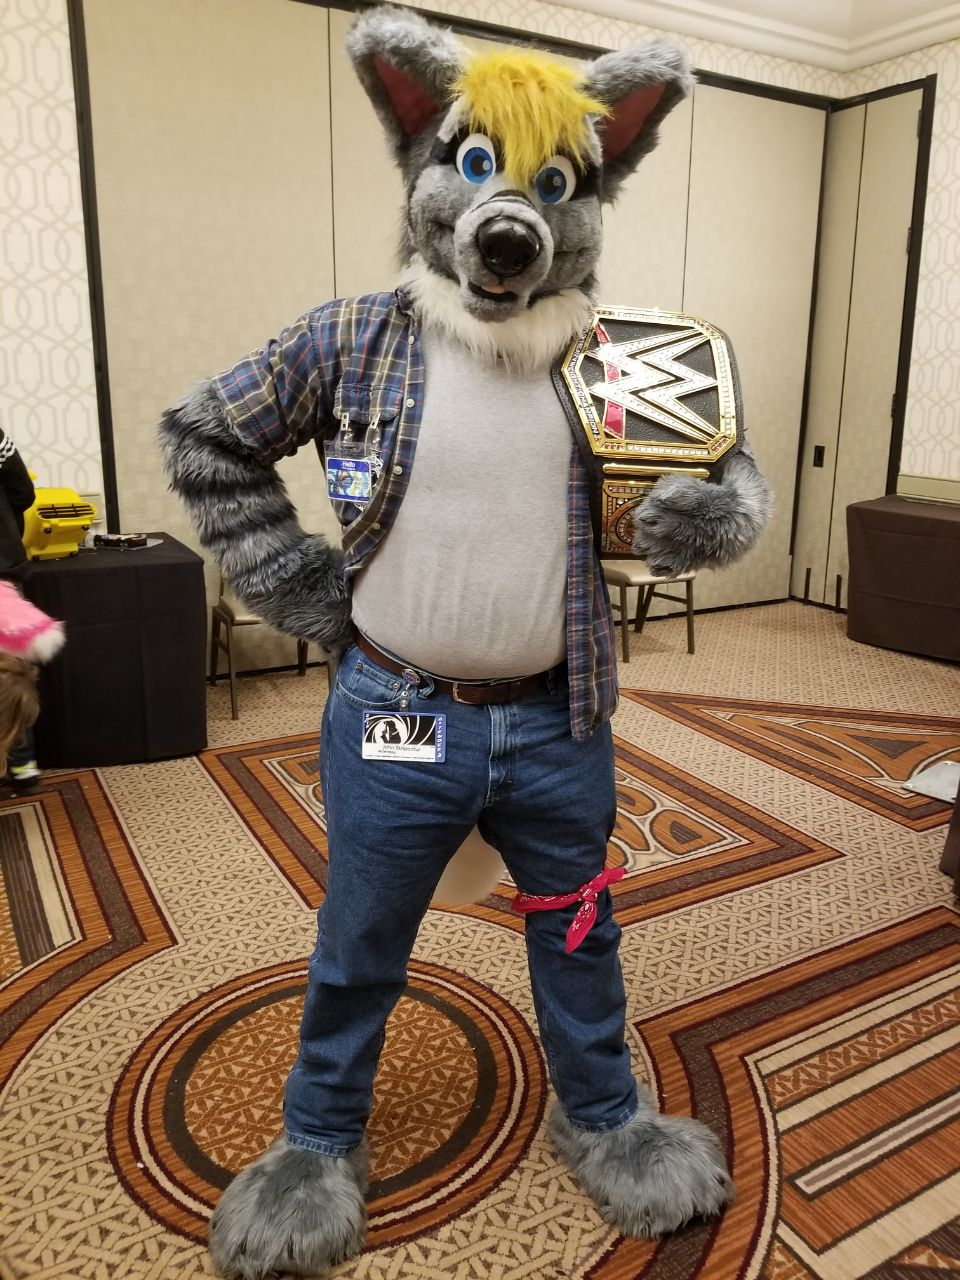 Most recent image: Stripedfur w/ new title belt